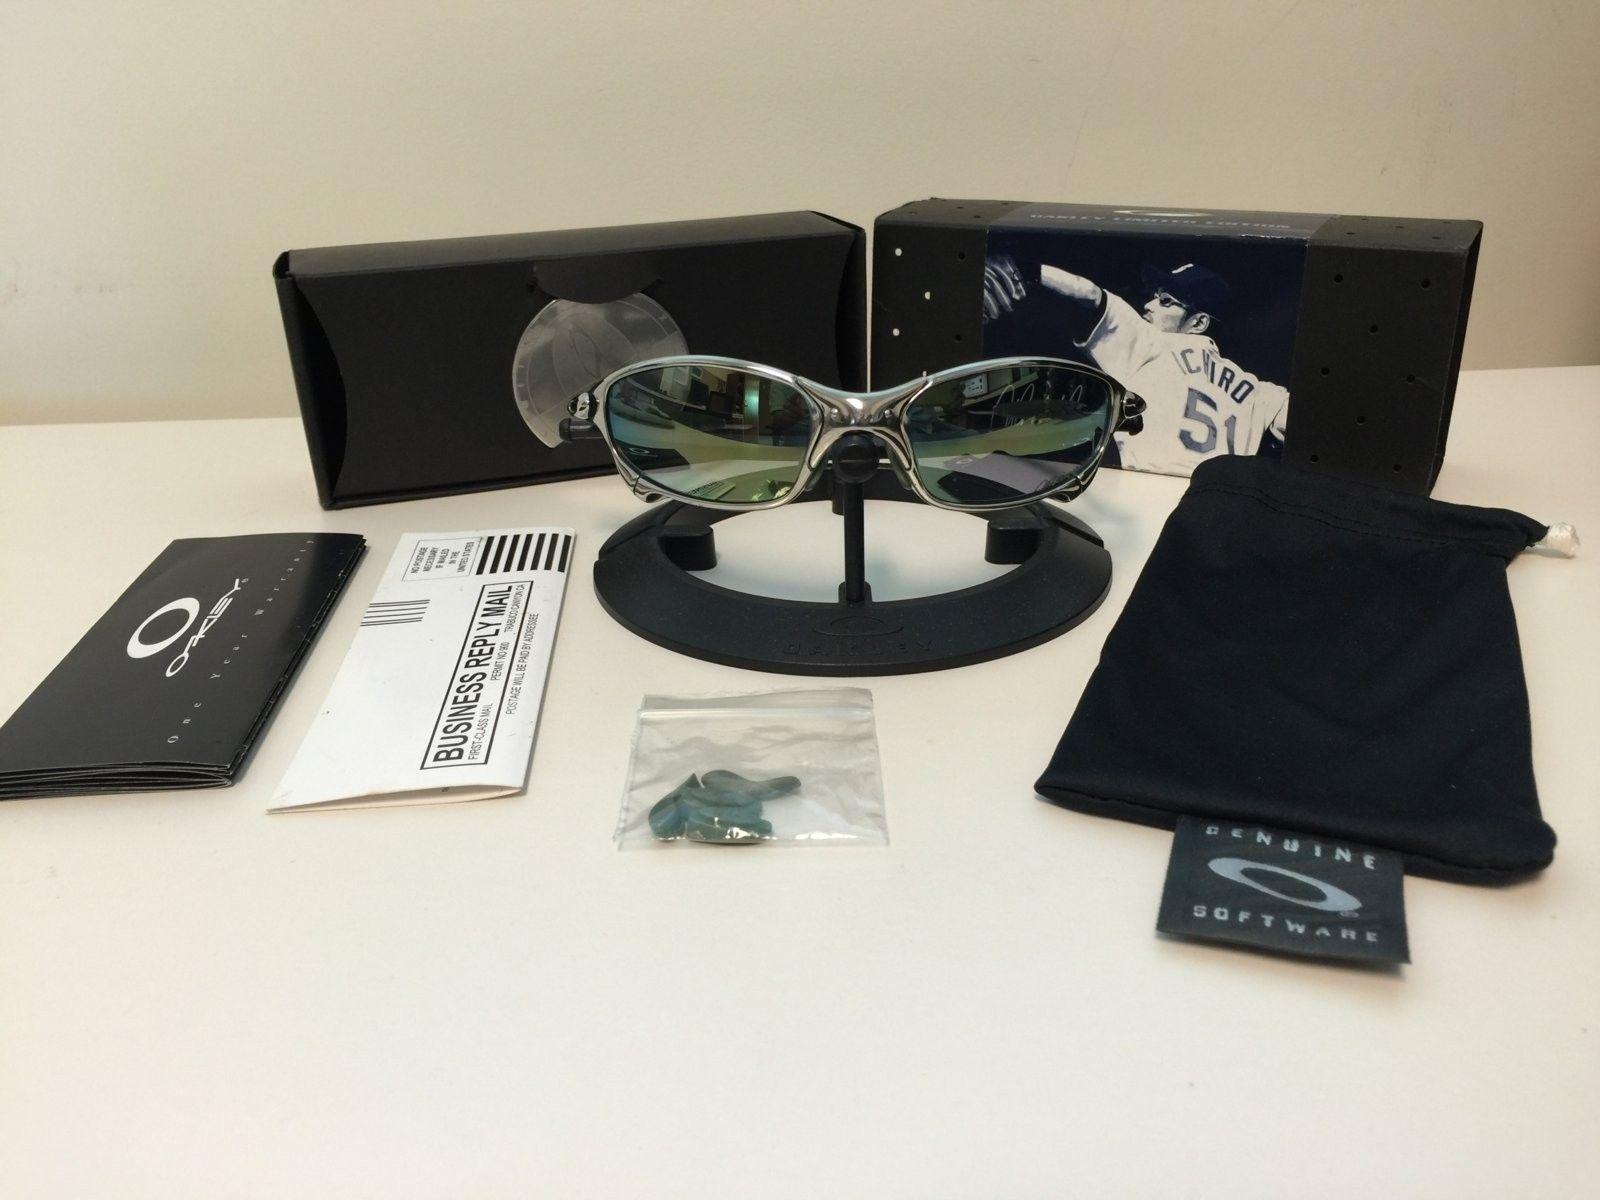 Polished /Emerald Slate Ichiro Juliet [US release, non-serial] - IMG_4481.JPG